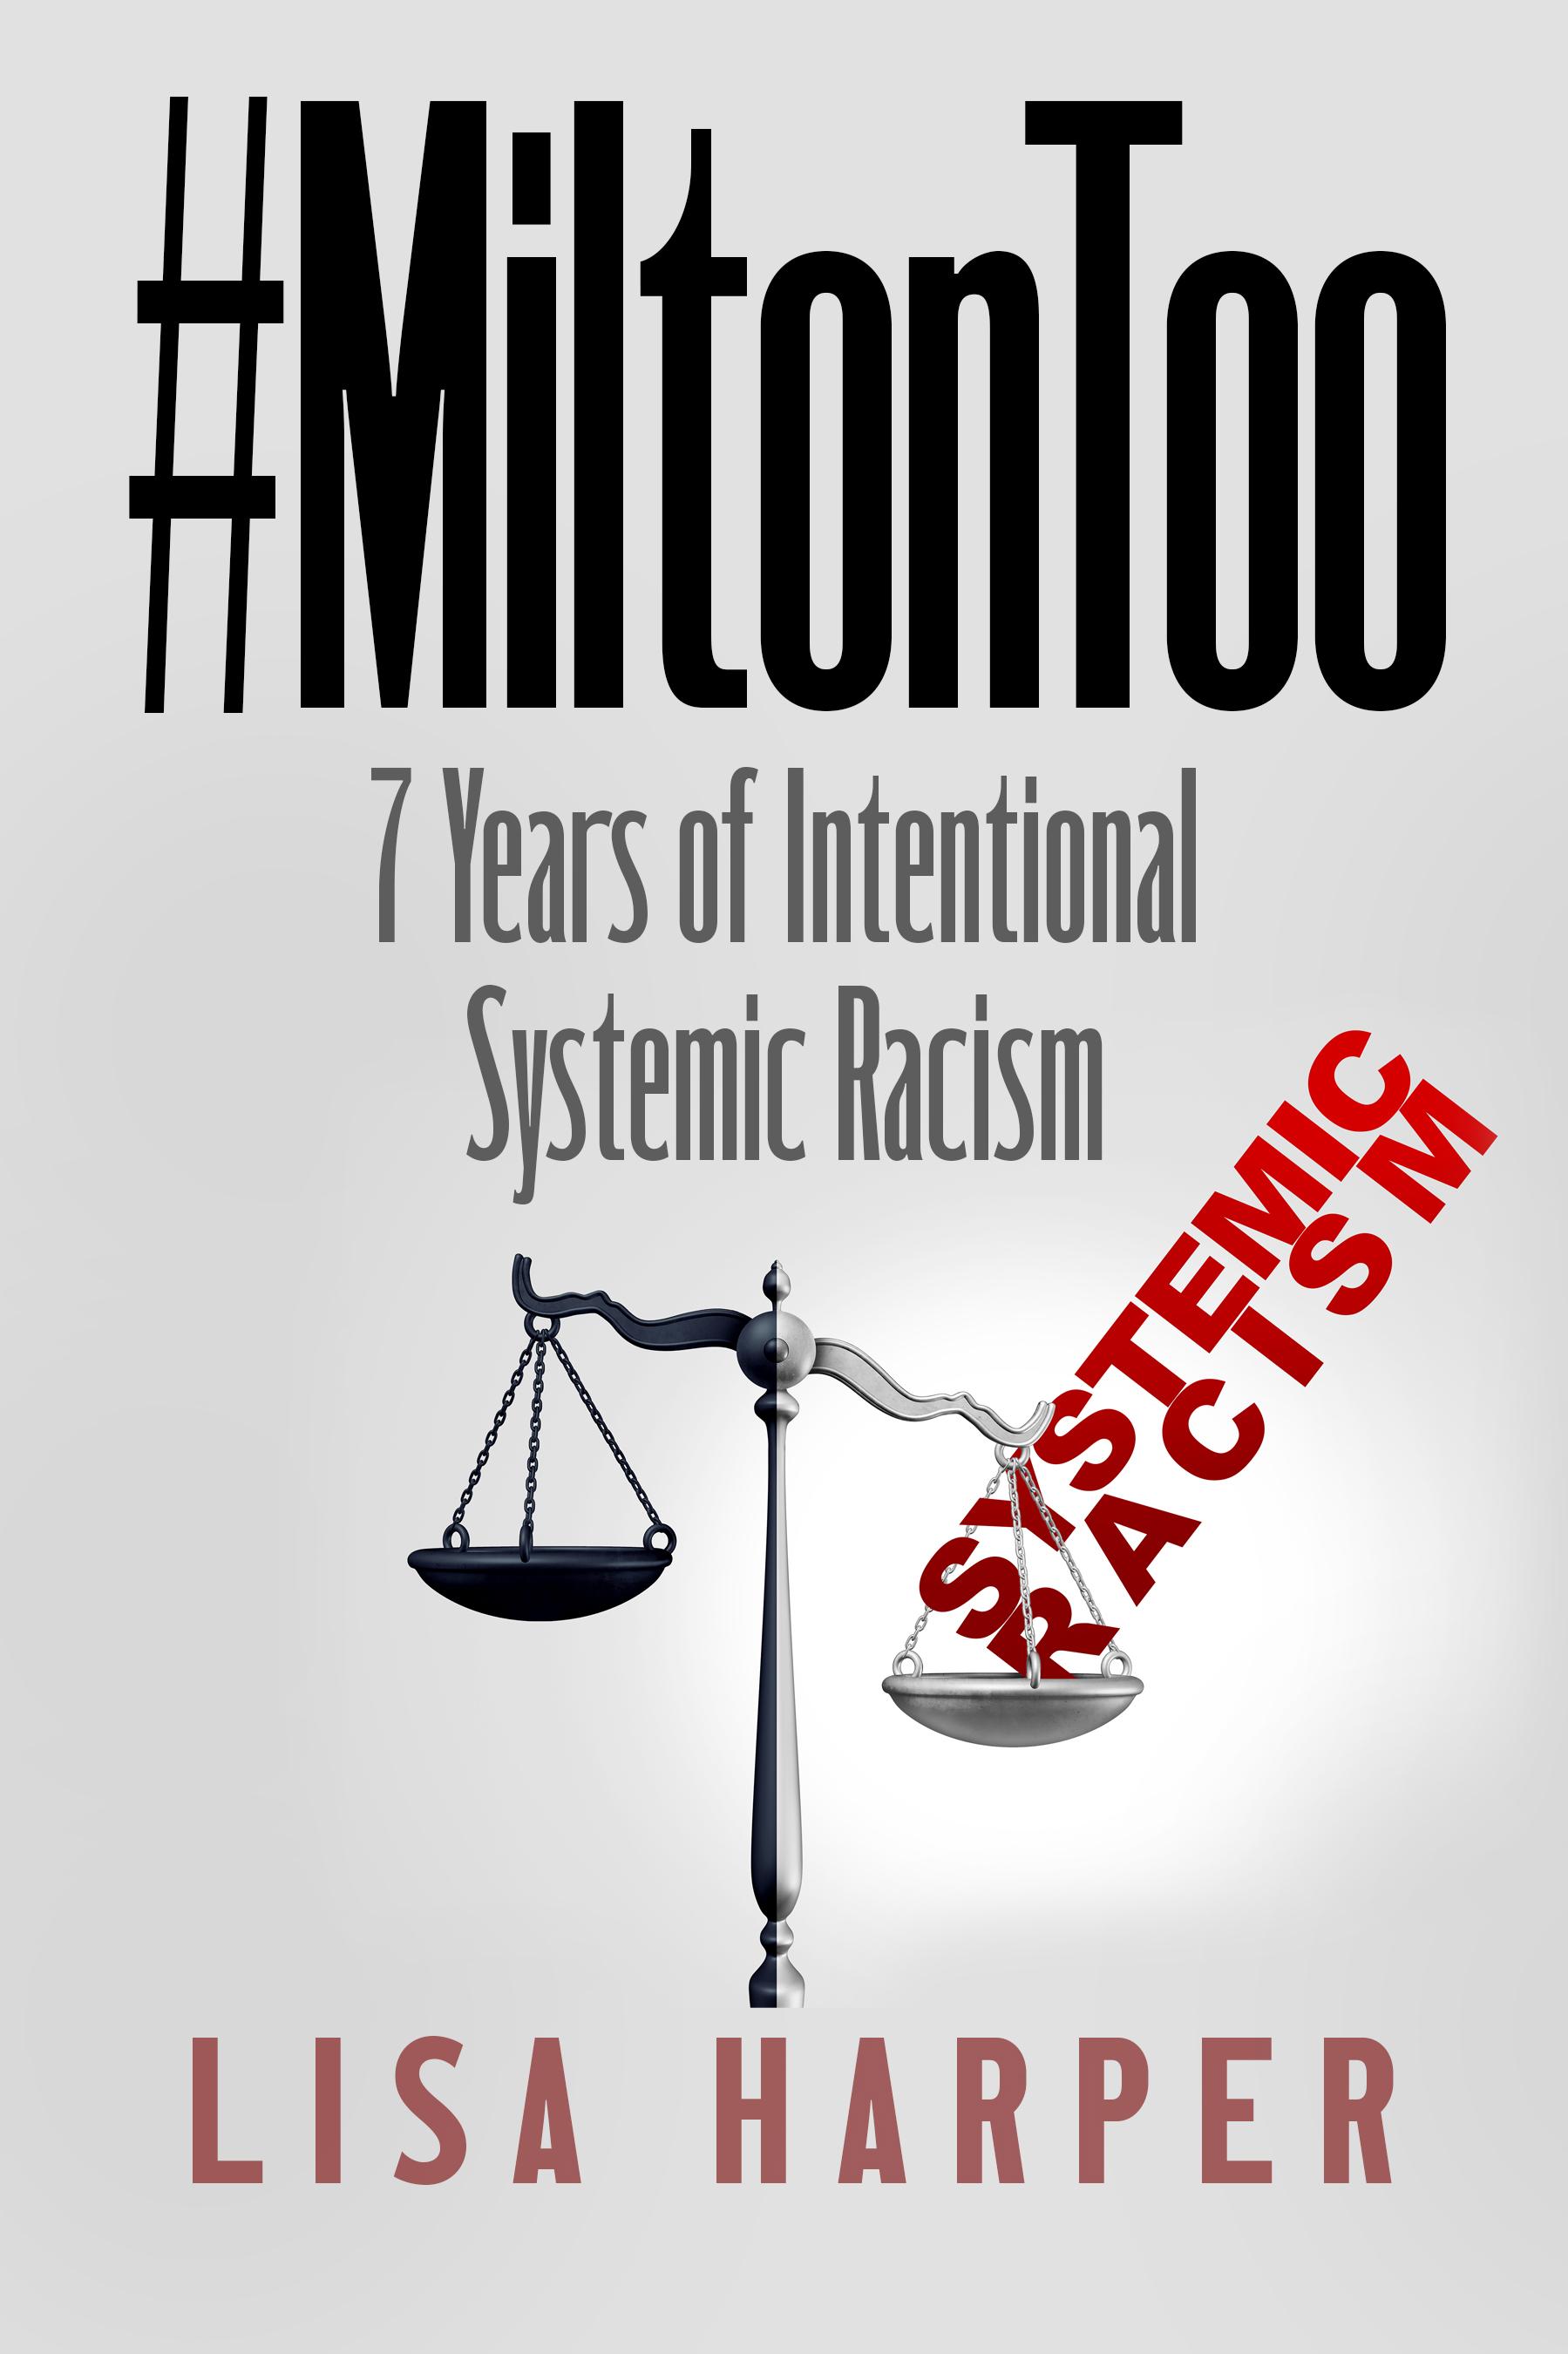 Lisa Harper In Her New Book, #MILTONTOO,Advocates Justice